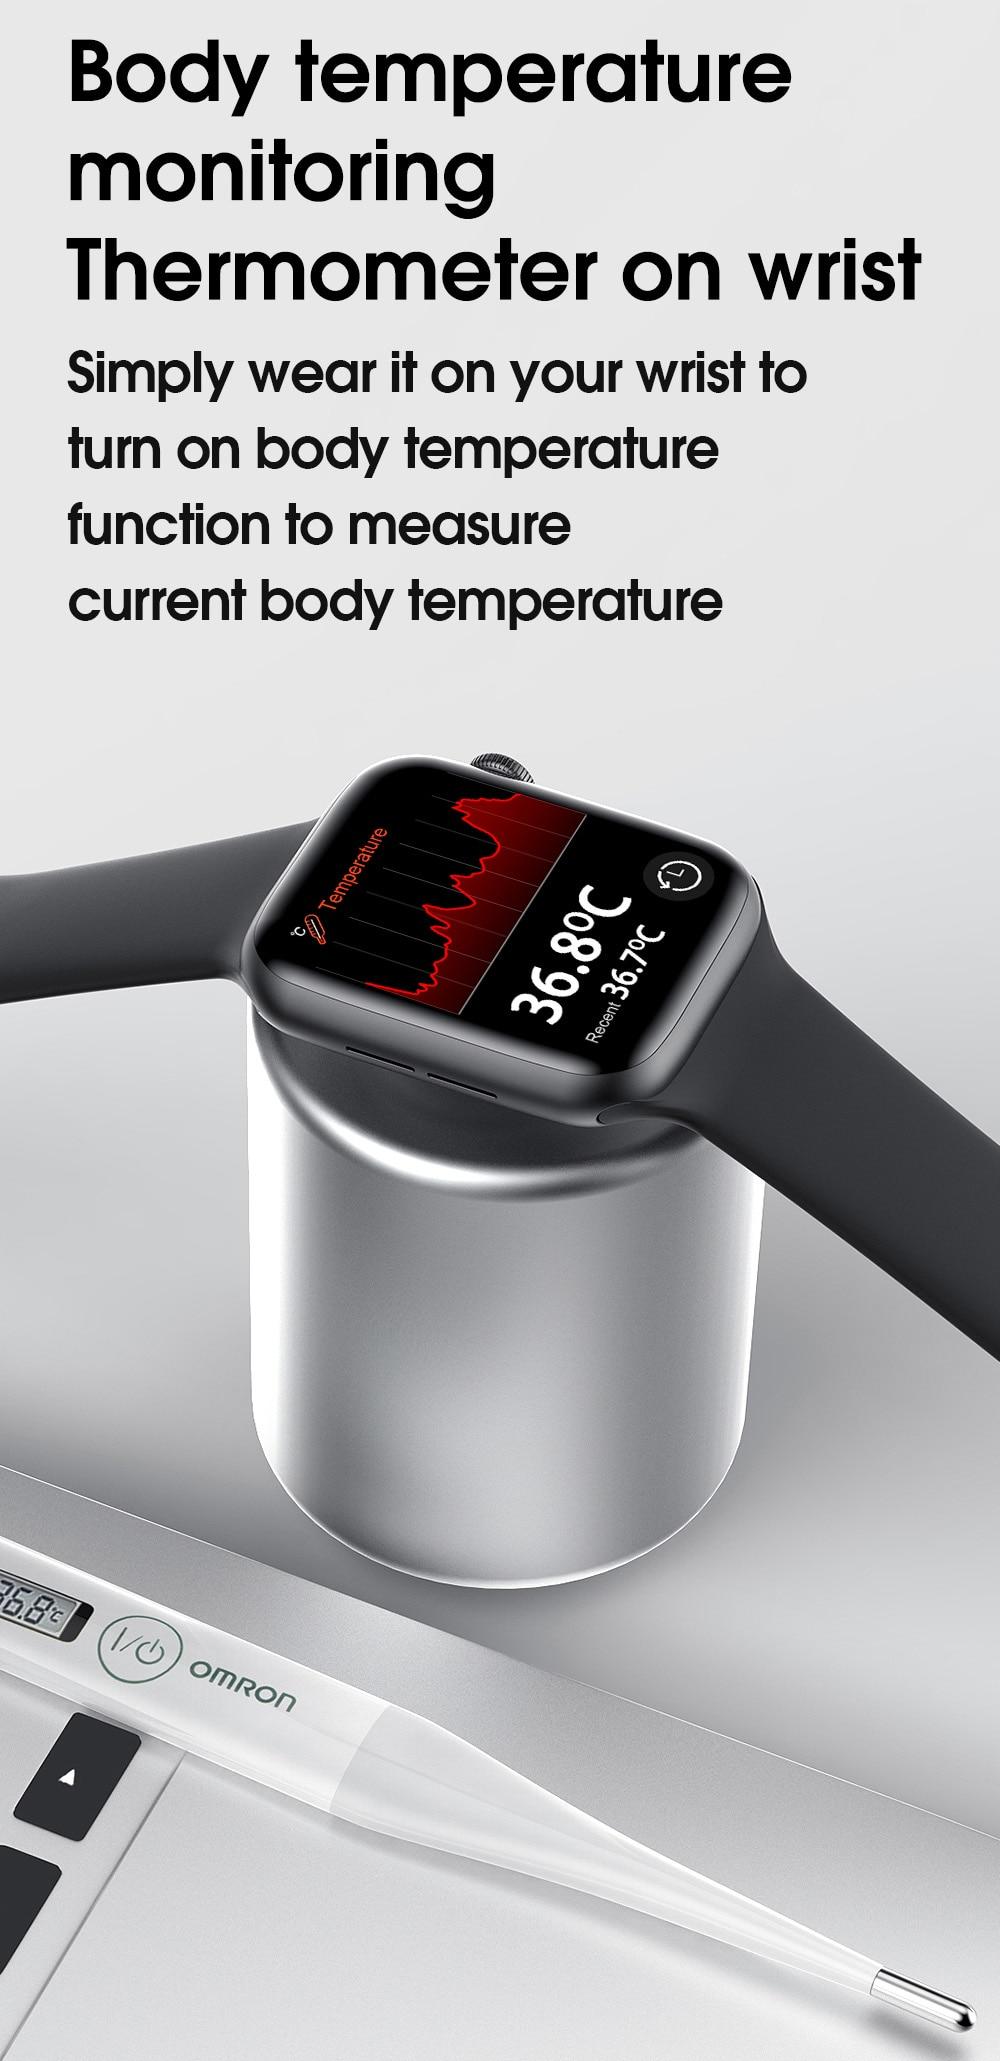 Hecc4d8d9c17341e1b8f847e4c3f90c45f TREZER IWO W26+ Pro Smart Watch 1.75 Inch 320*385 Series 6 IPS Full Touch Screen Custom Watch Face Smartwatch Men Women PK HW22